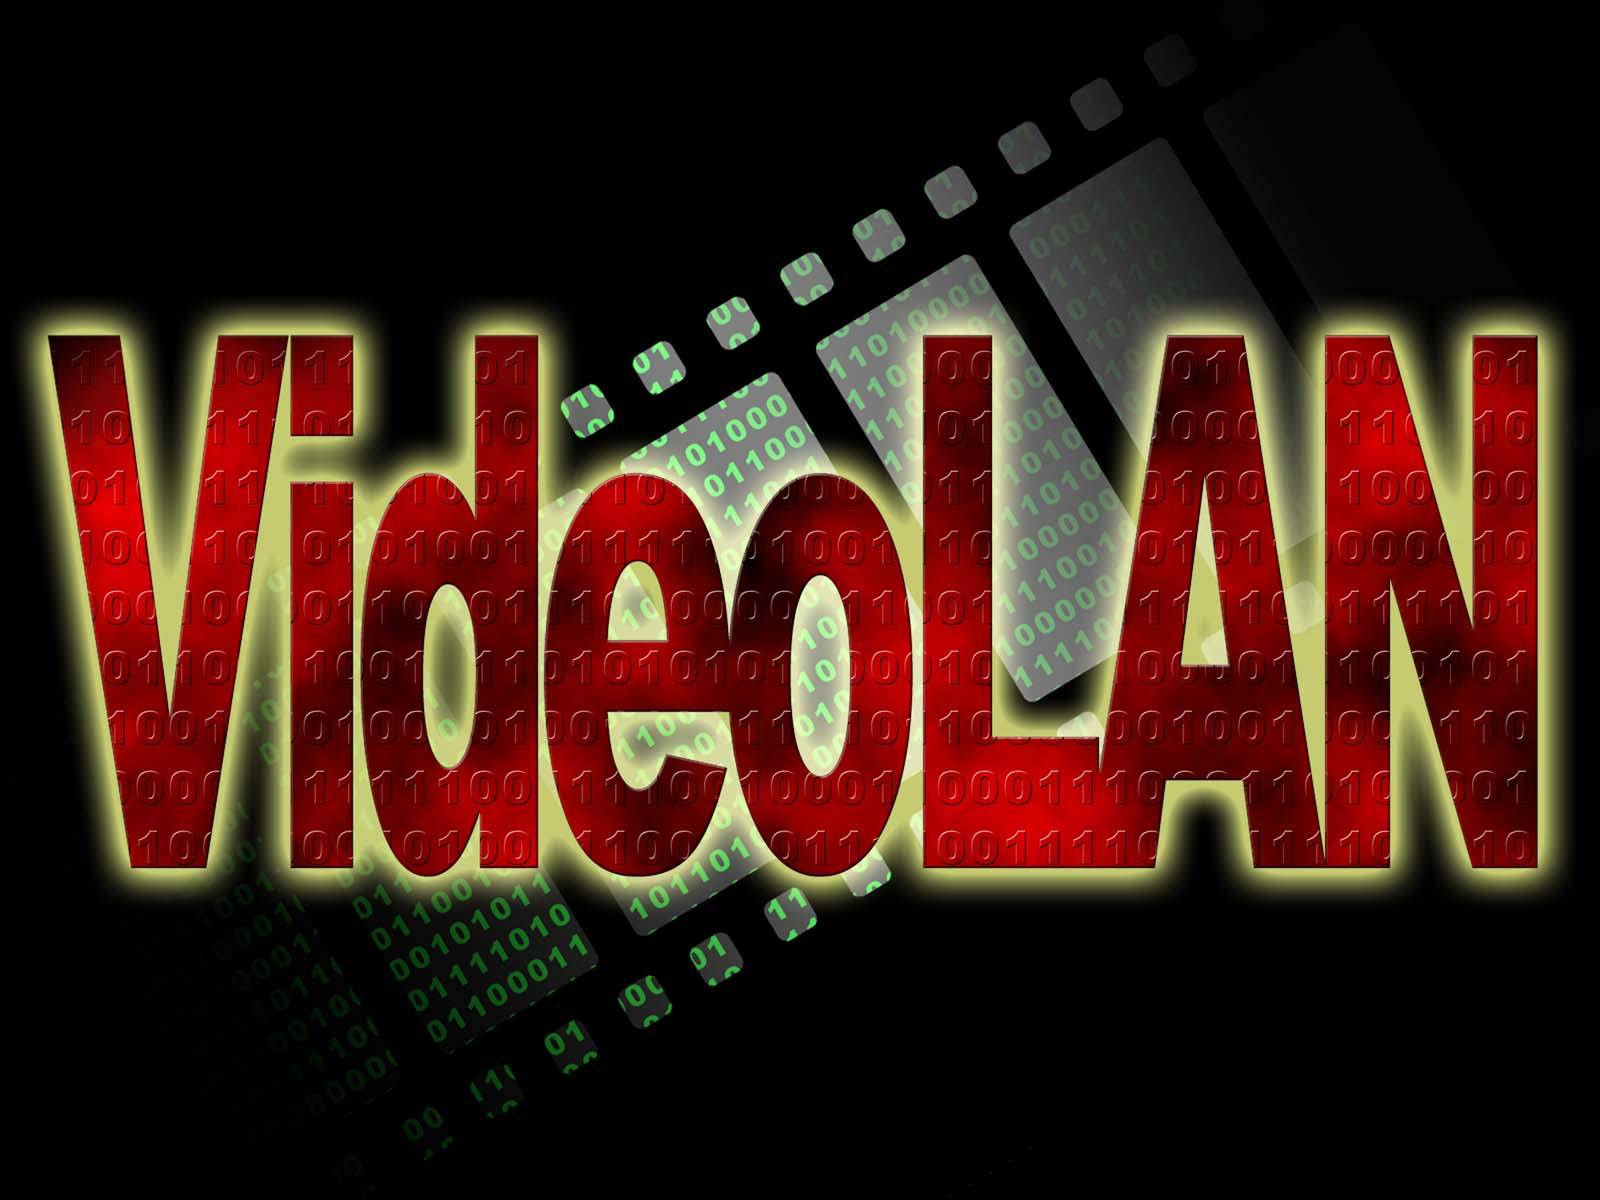 www.videolan.org/images/goodies/videolan/vl1_1600x1200.jpg